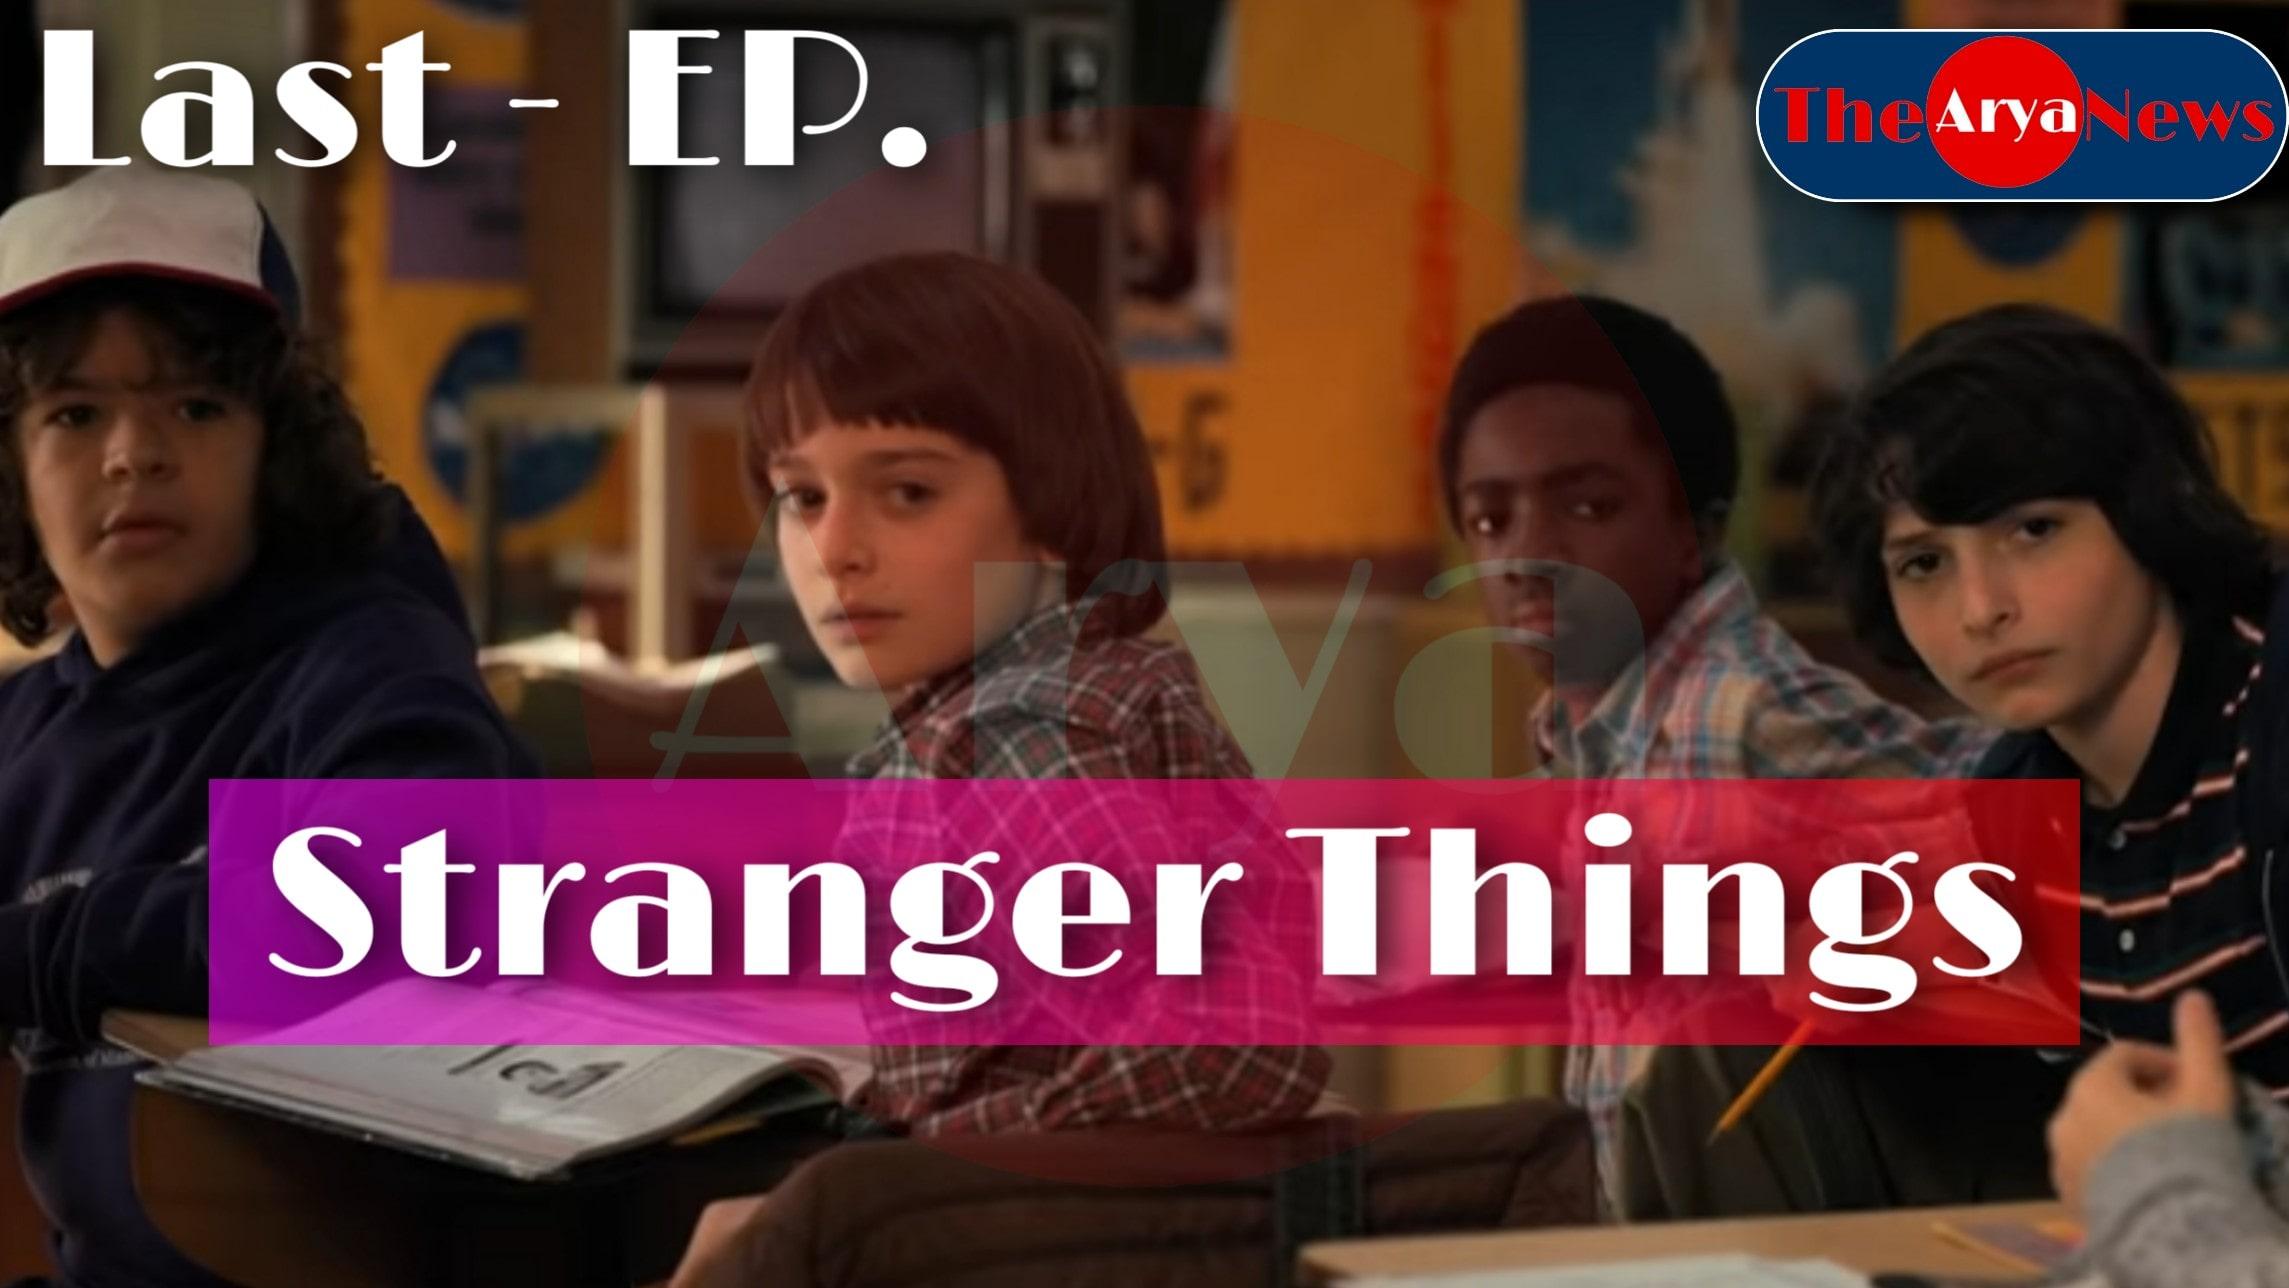 Stranger Things Watch Online (Last Season) Full Web Series HD Free 1080p